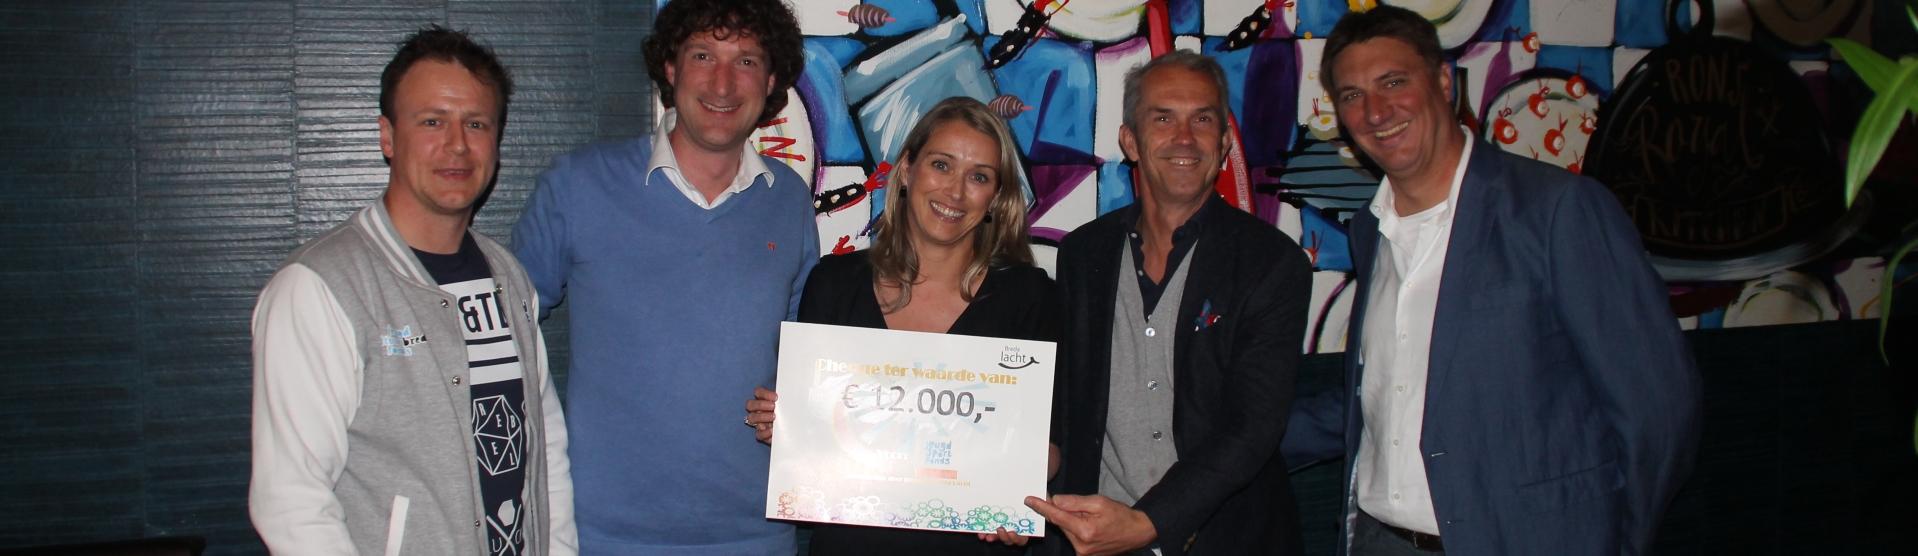 Jeugd Sportfonds Breda ontvangt €12.000,- van Ronde Tafel 21